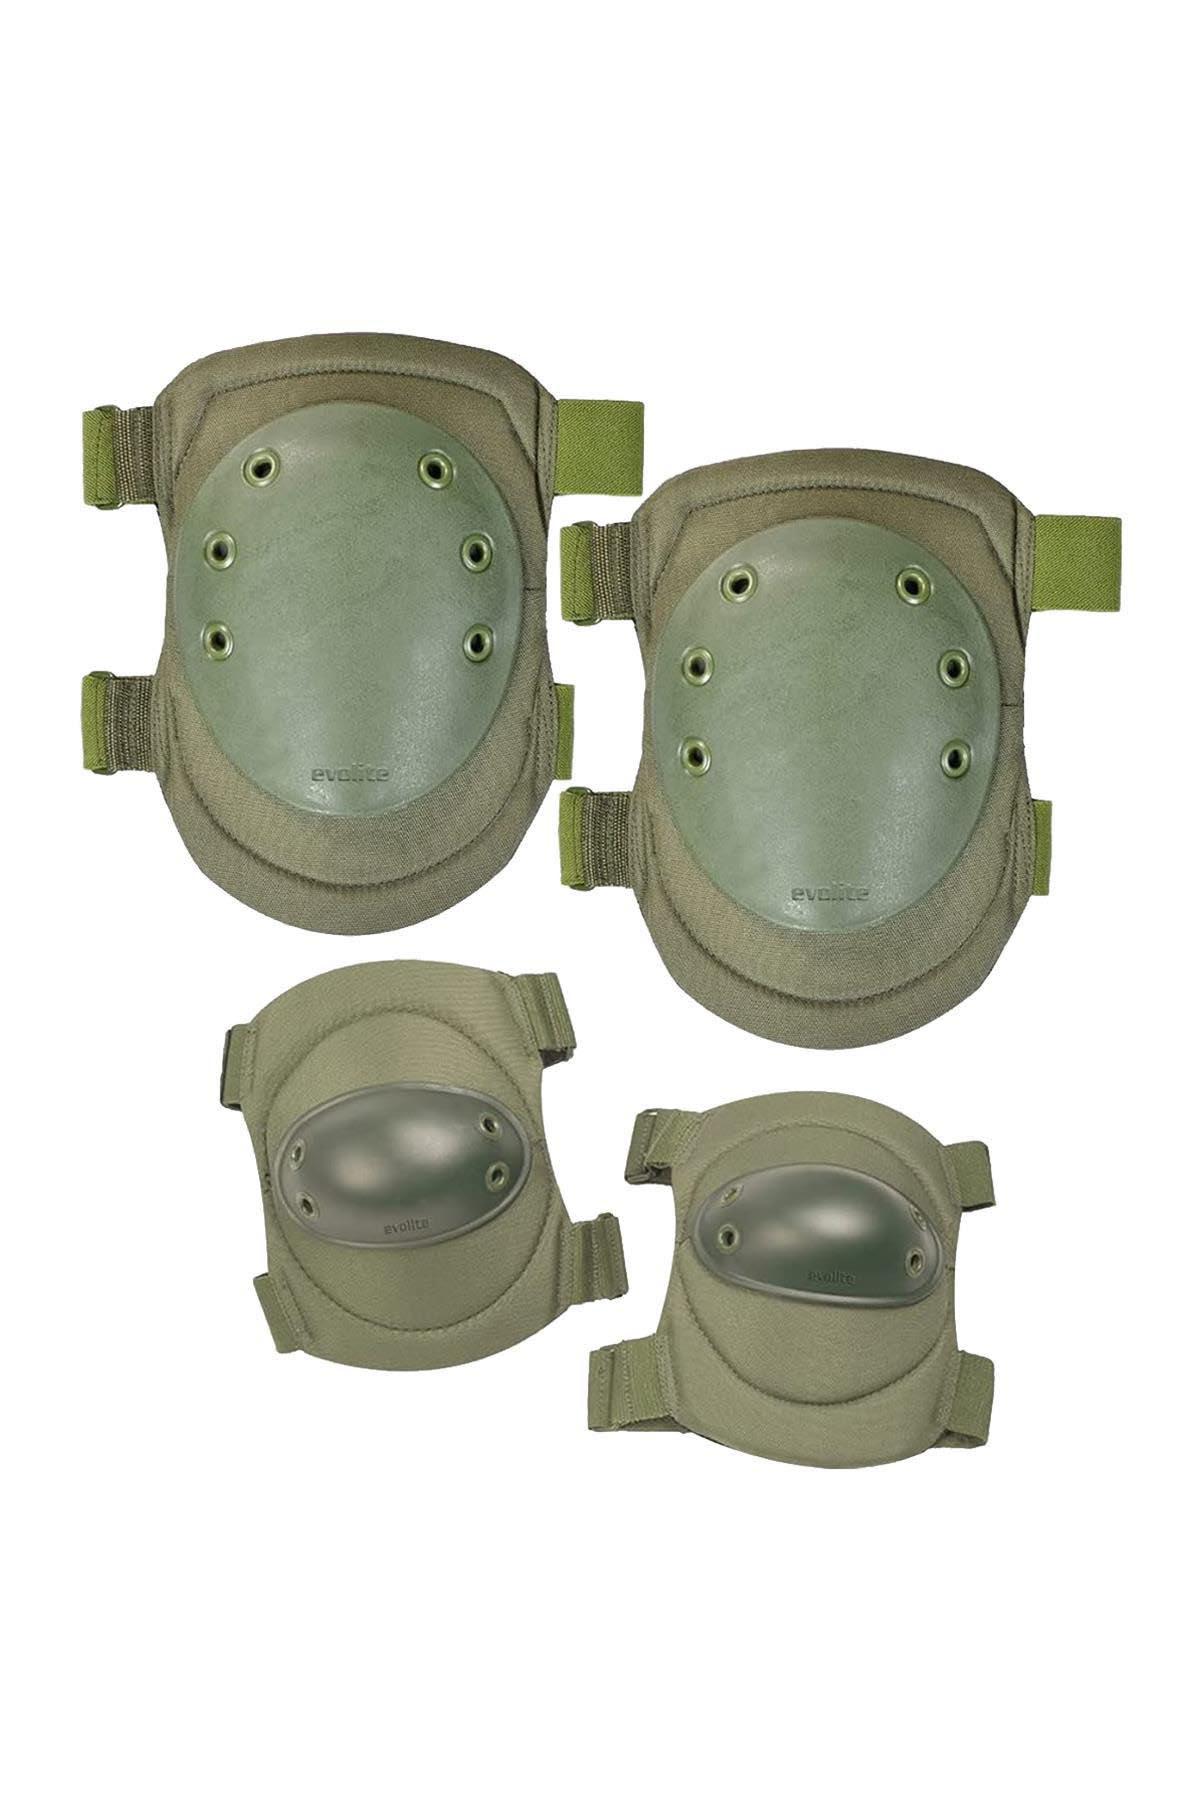 Evolıte Protector Dizlik Dirseklik Set E-5518